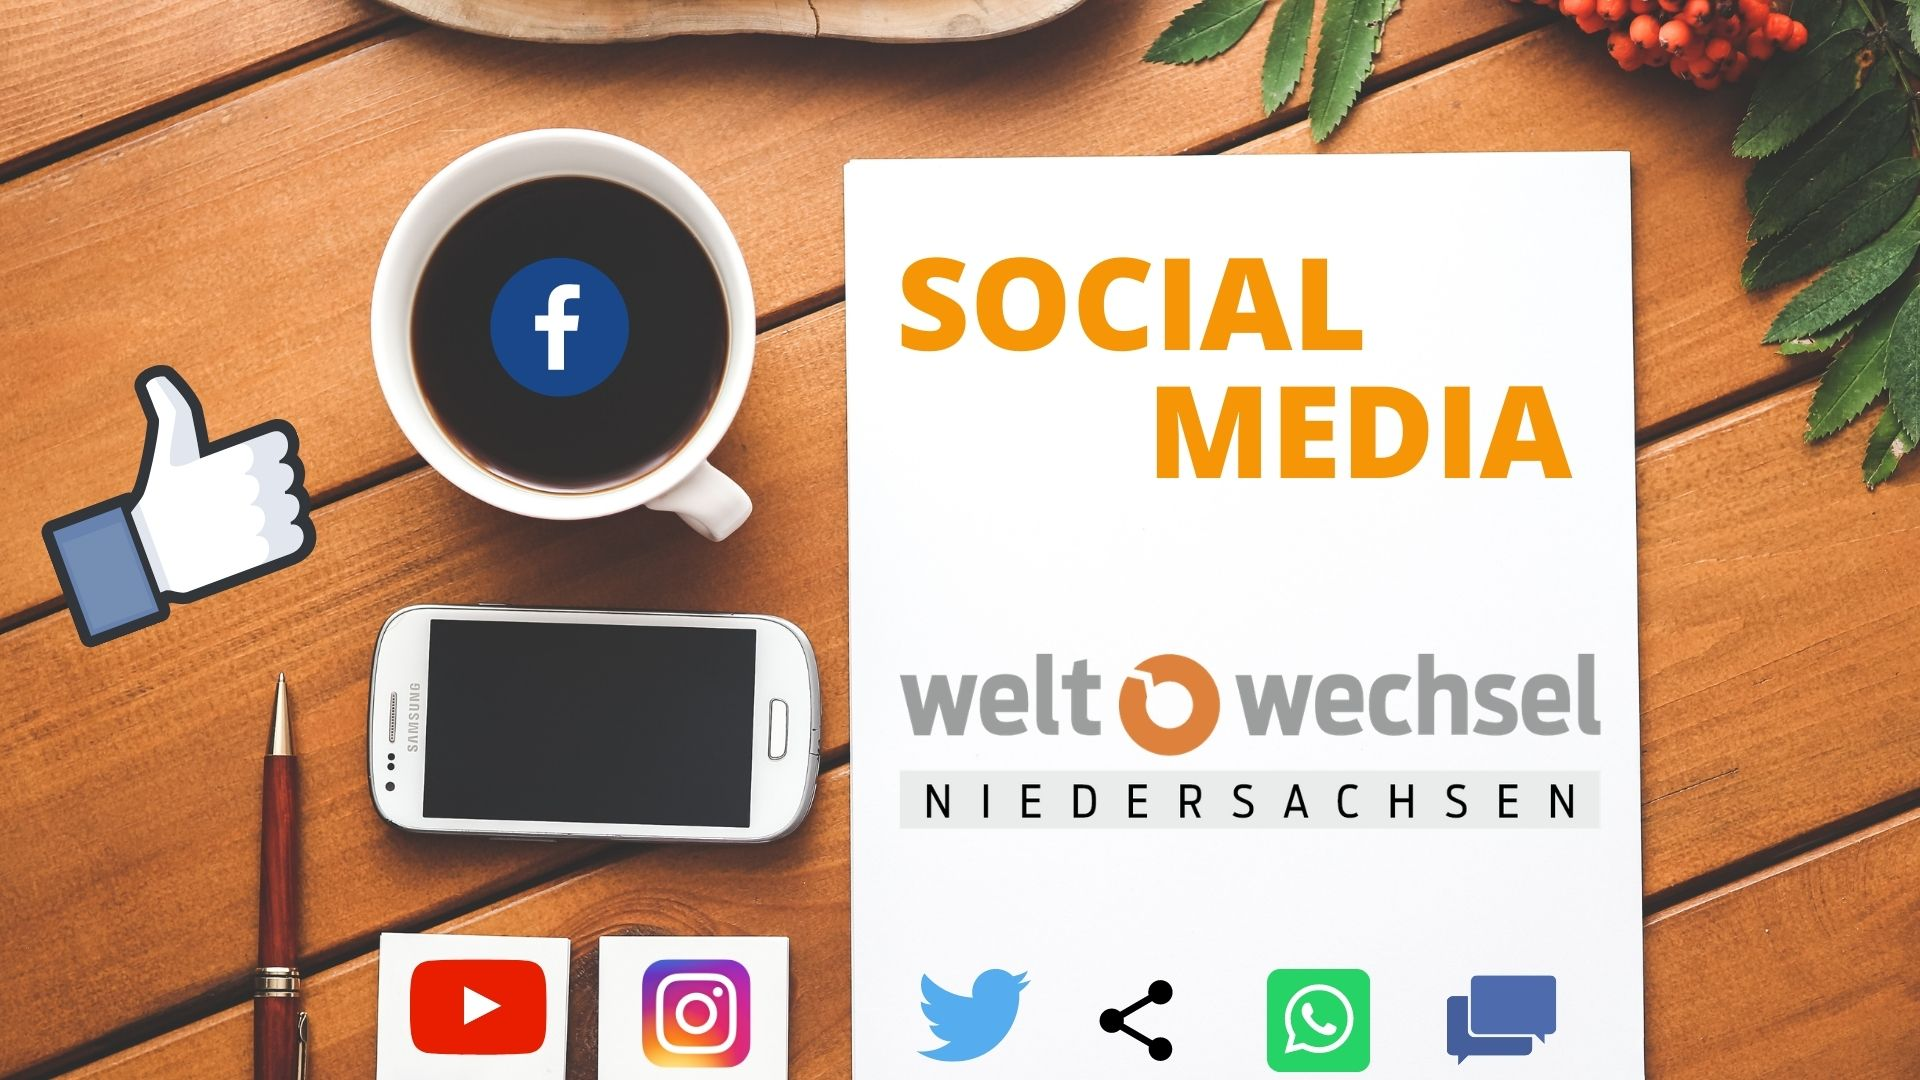 Social Media weltwechsel